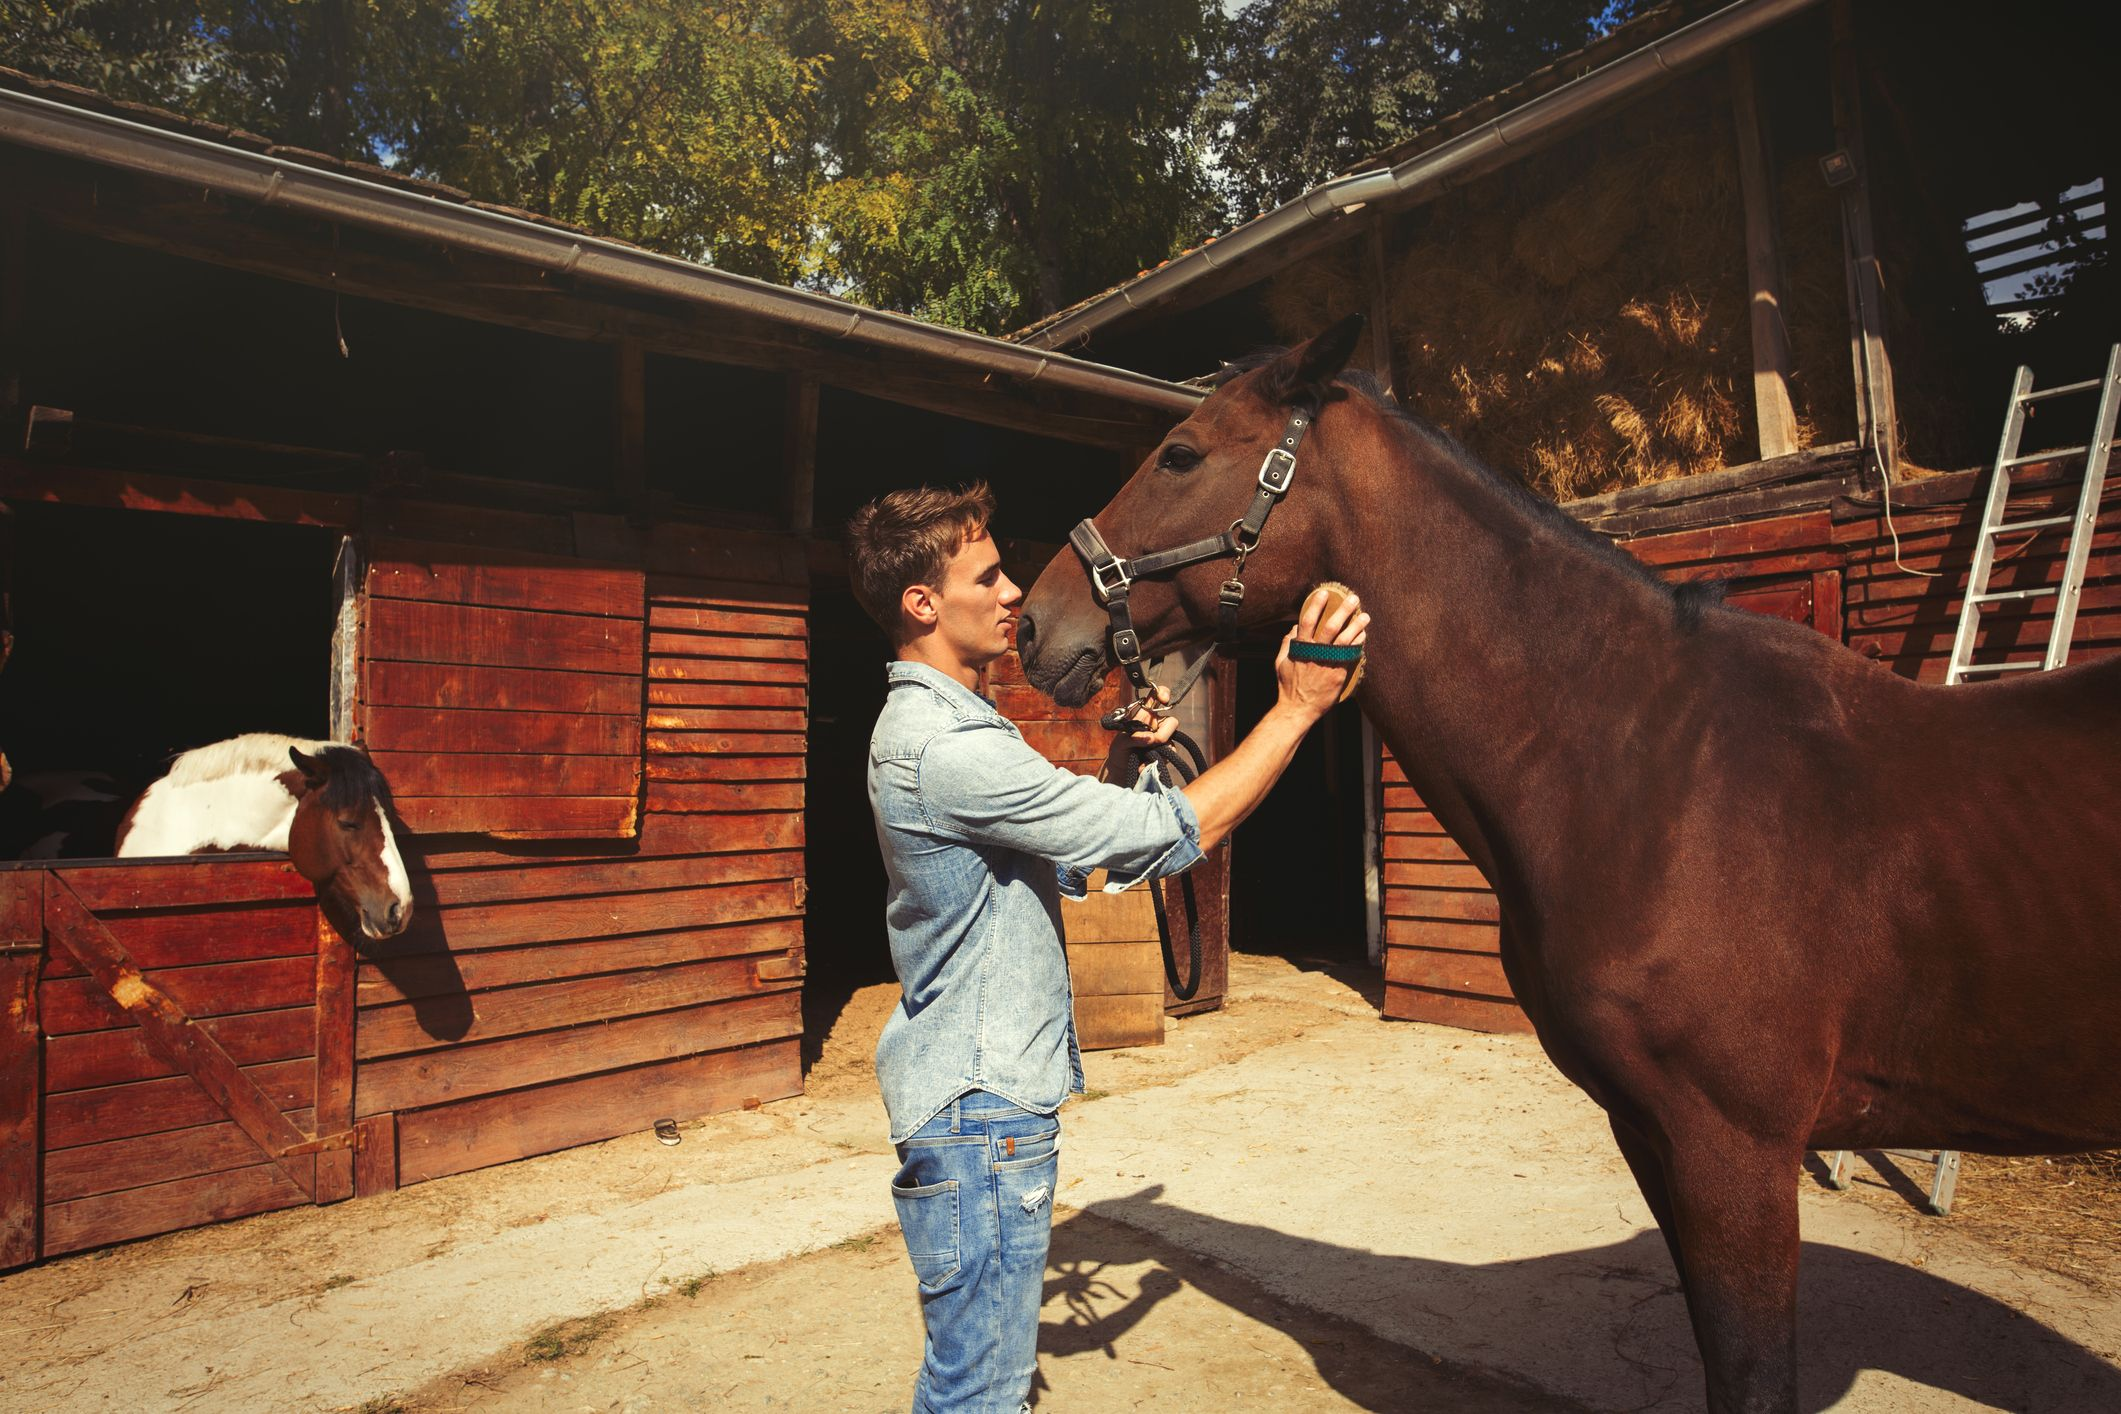 limpiar caballo